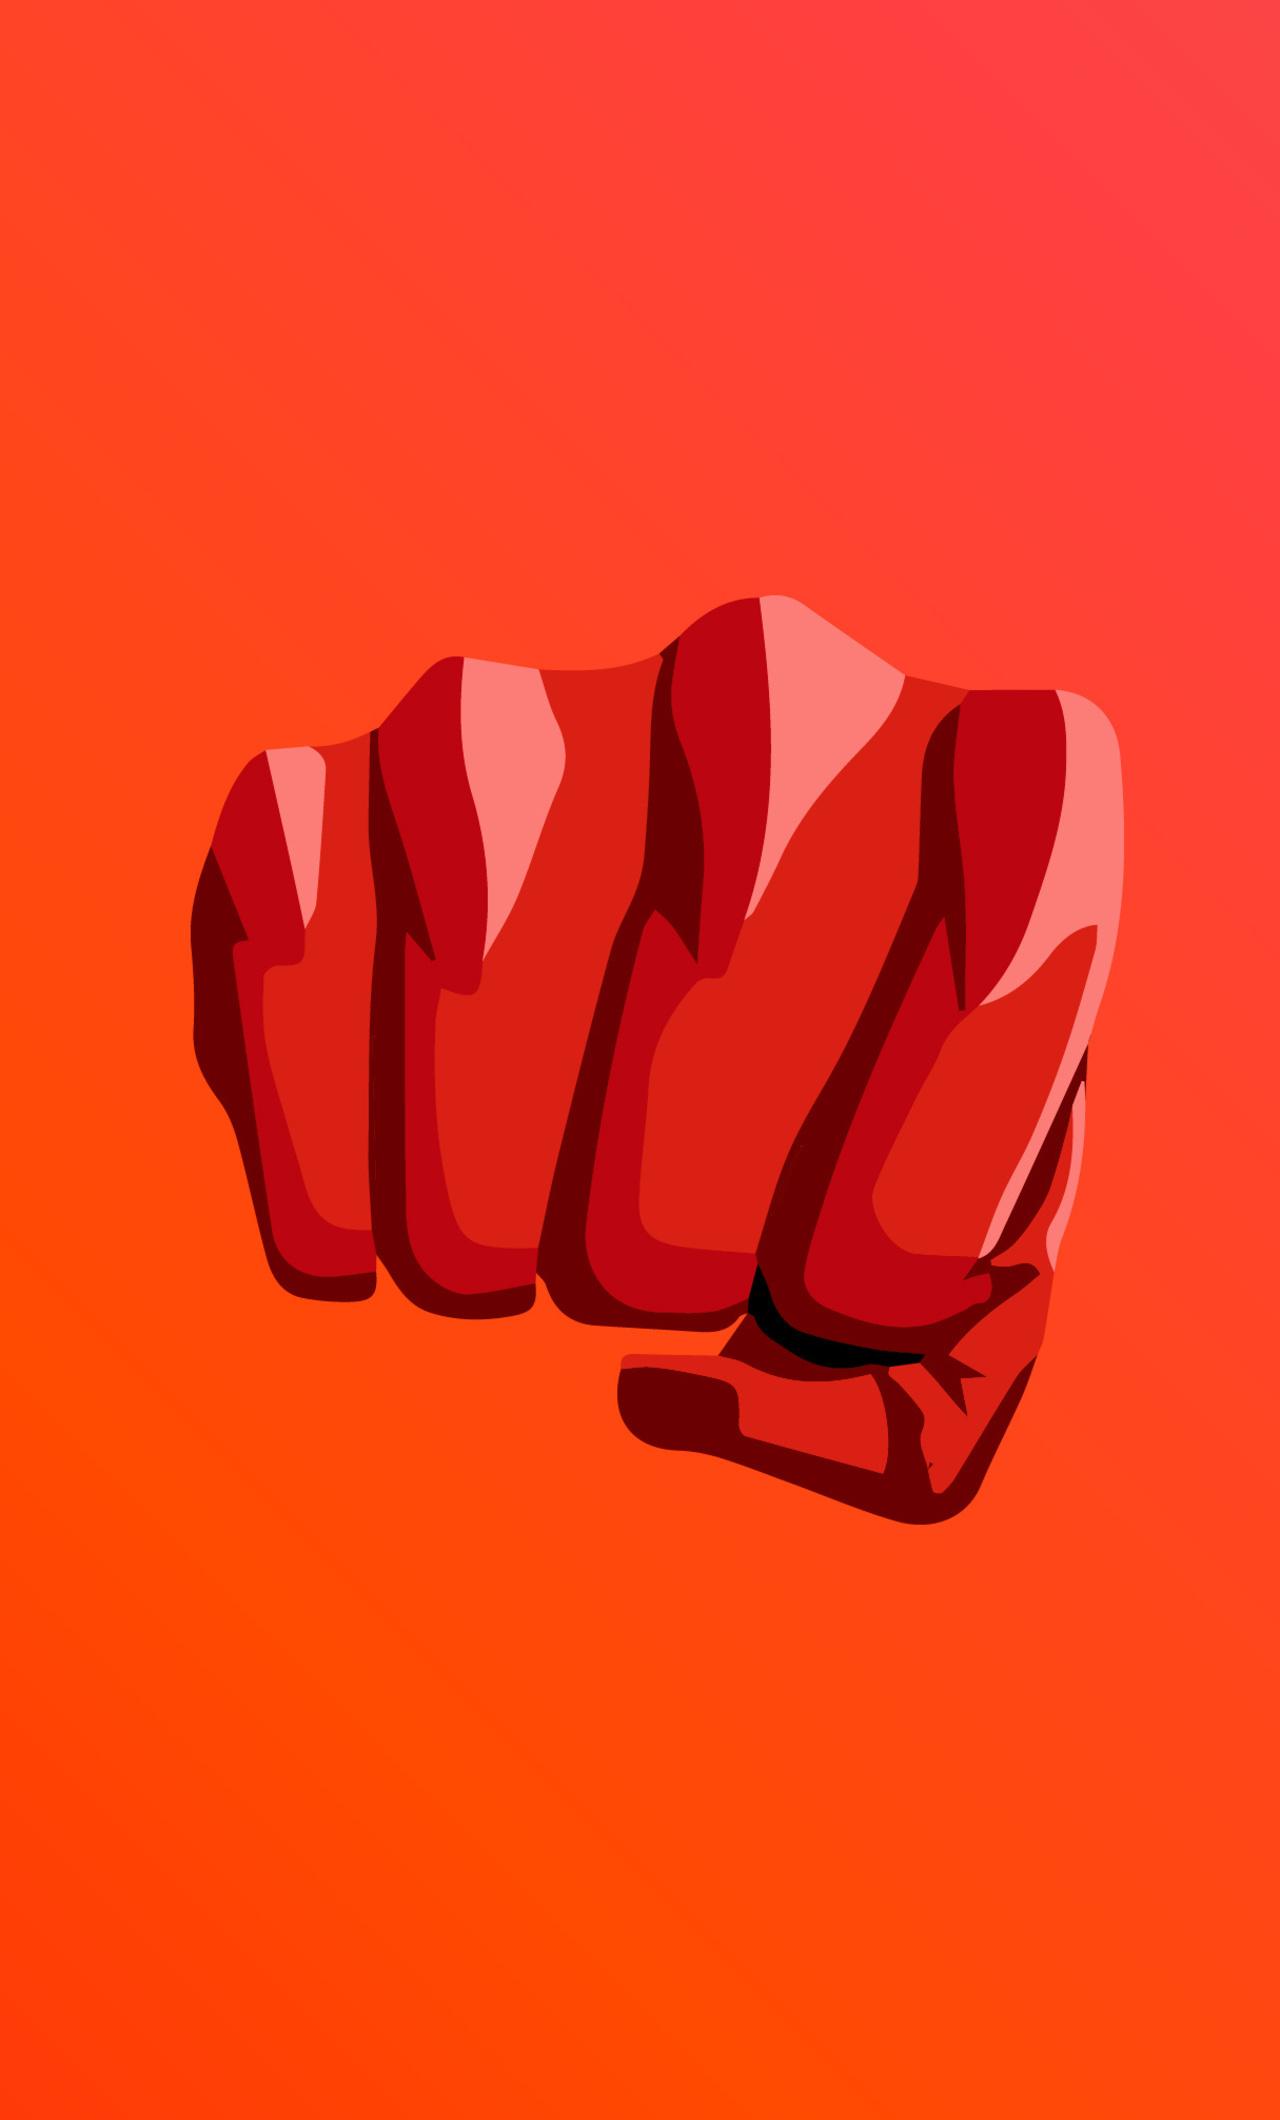 one-punch-man-minimalist-4k-vc.jpg